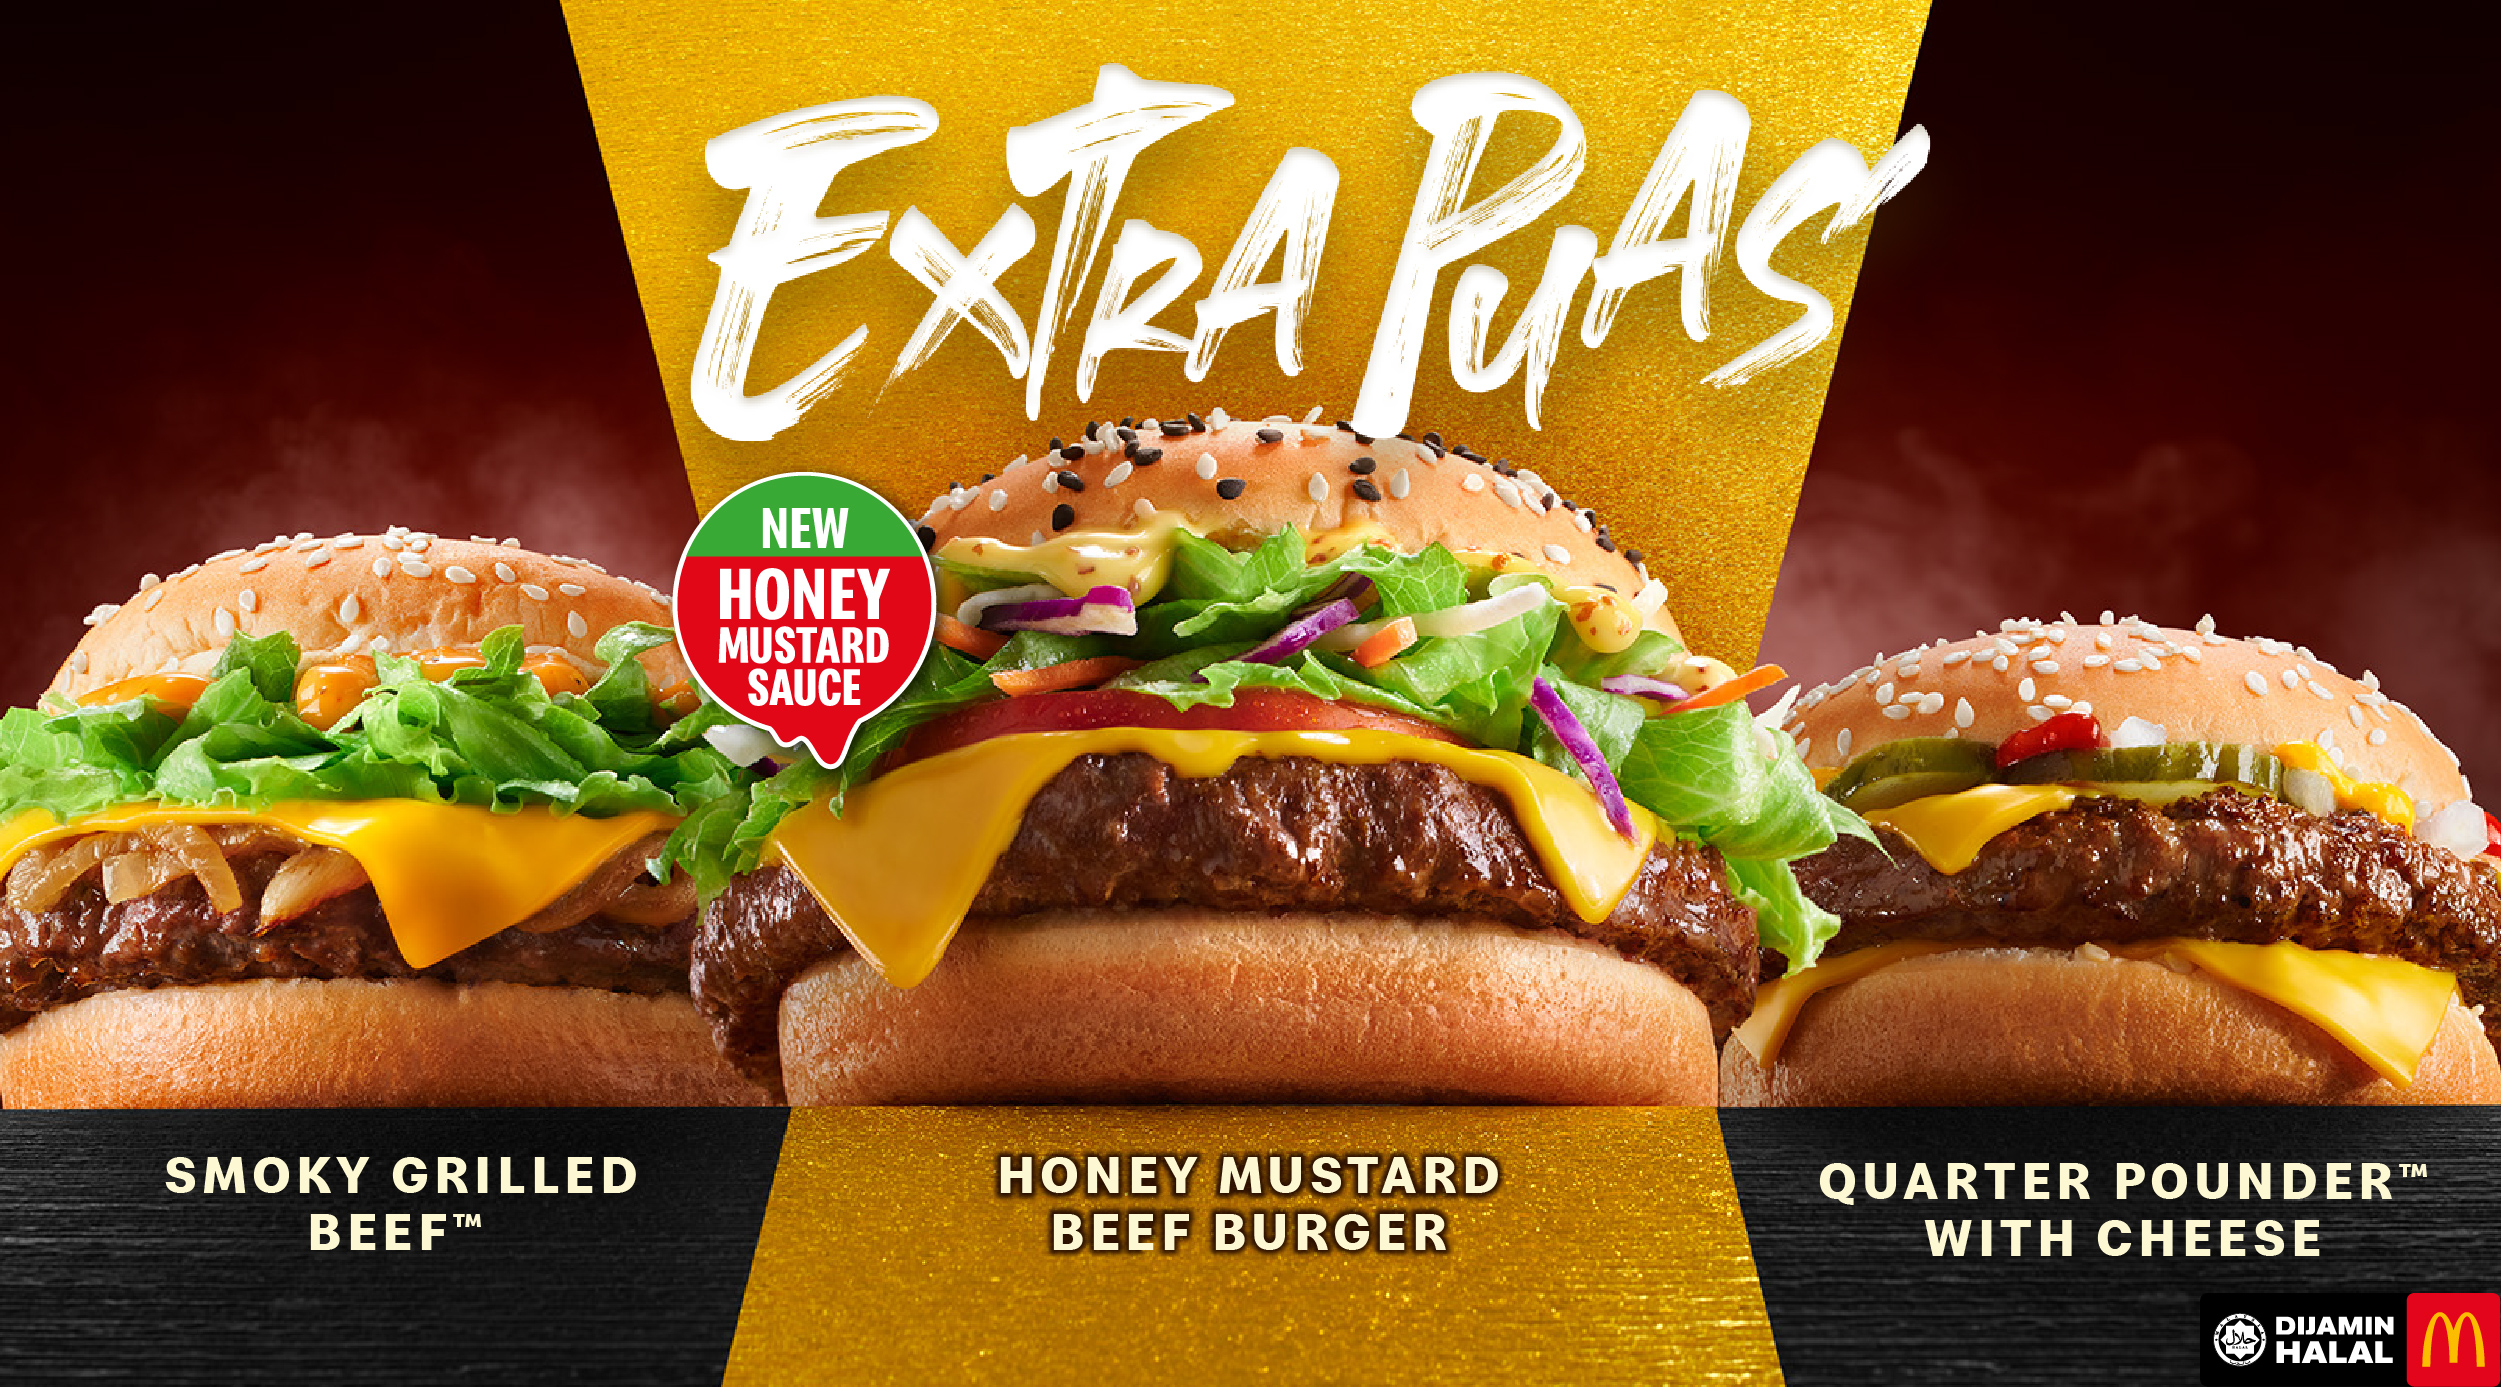 McDonald's Honey Mustard Beef Burger